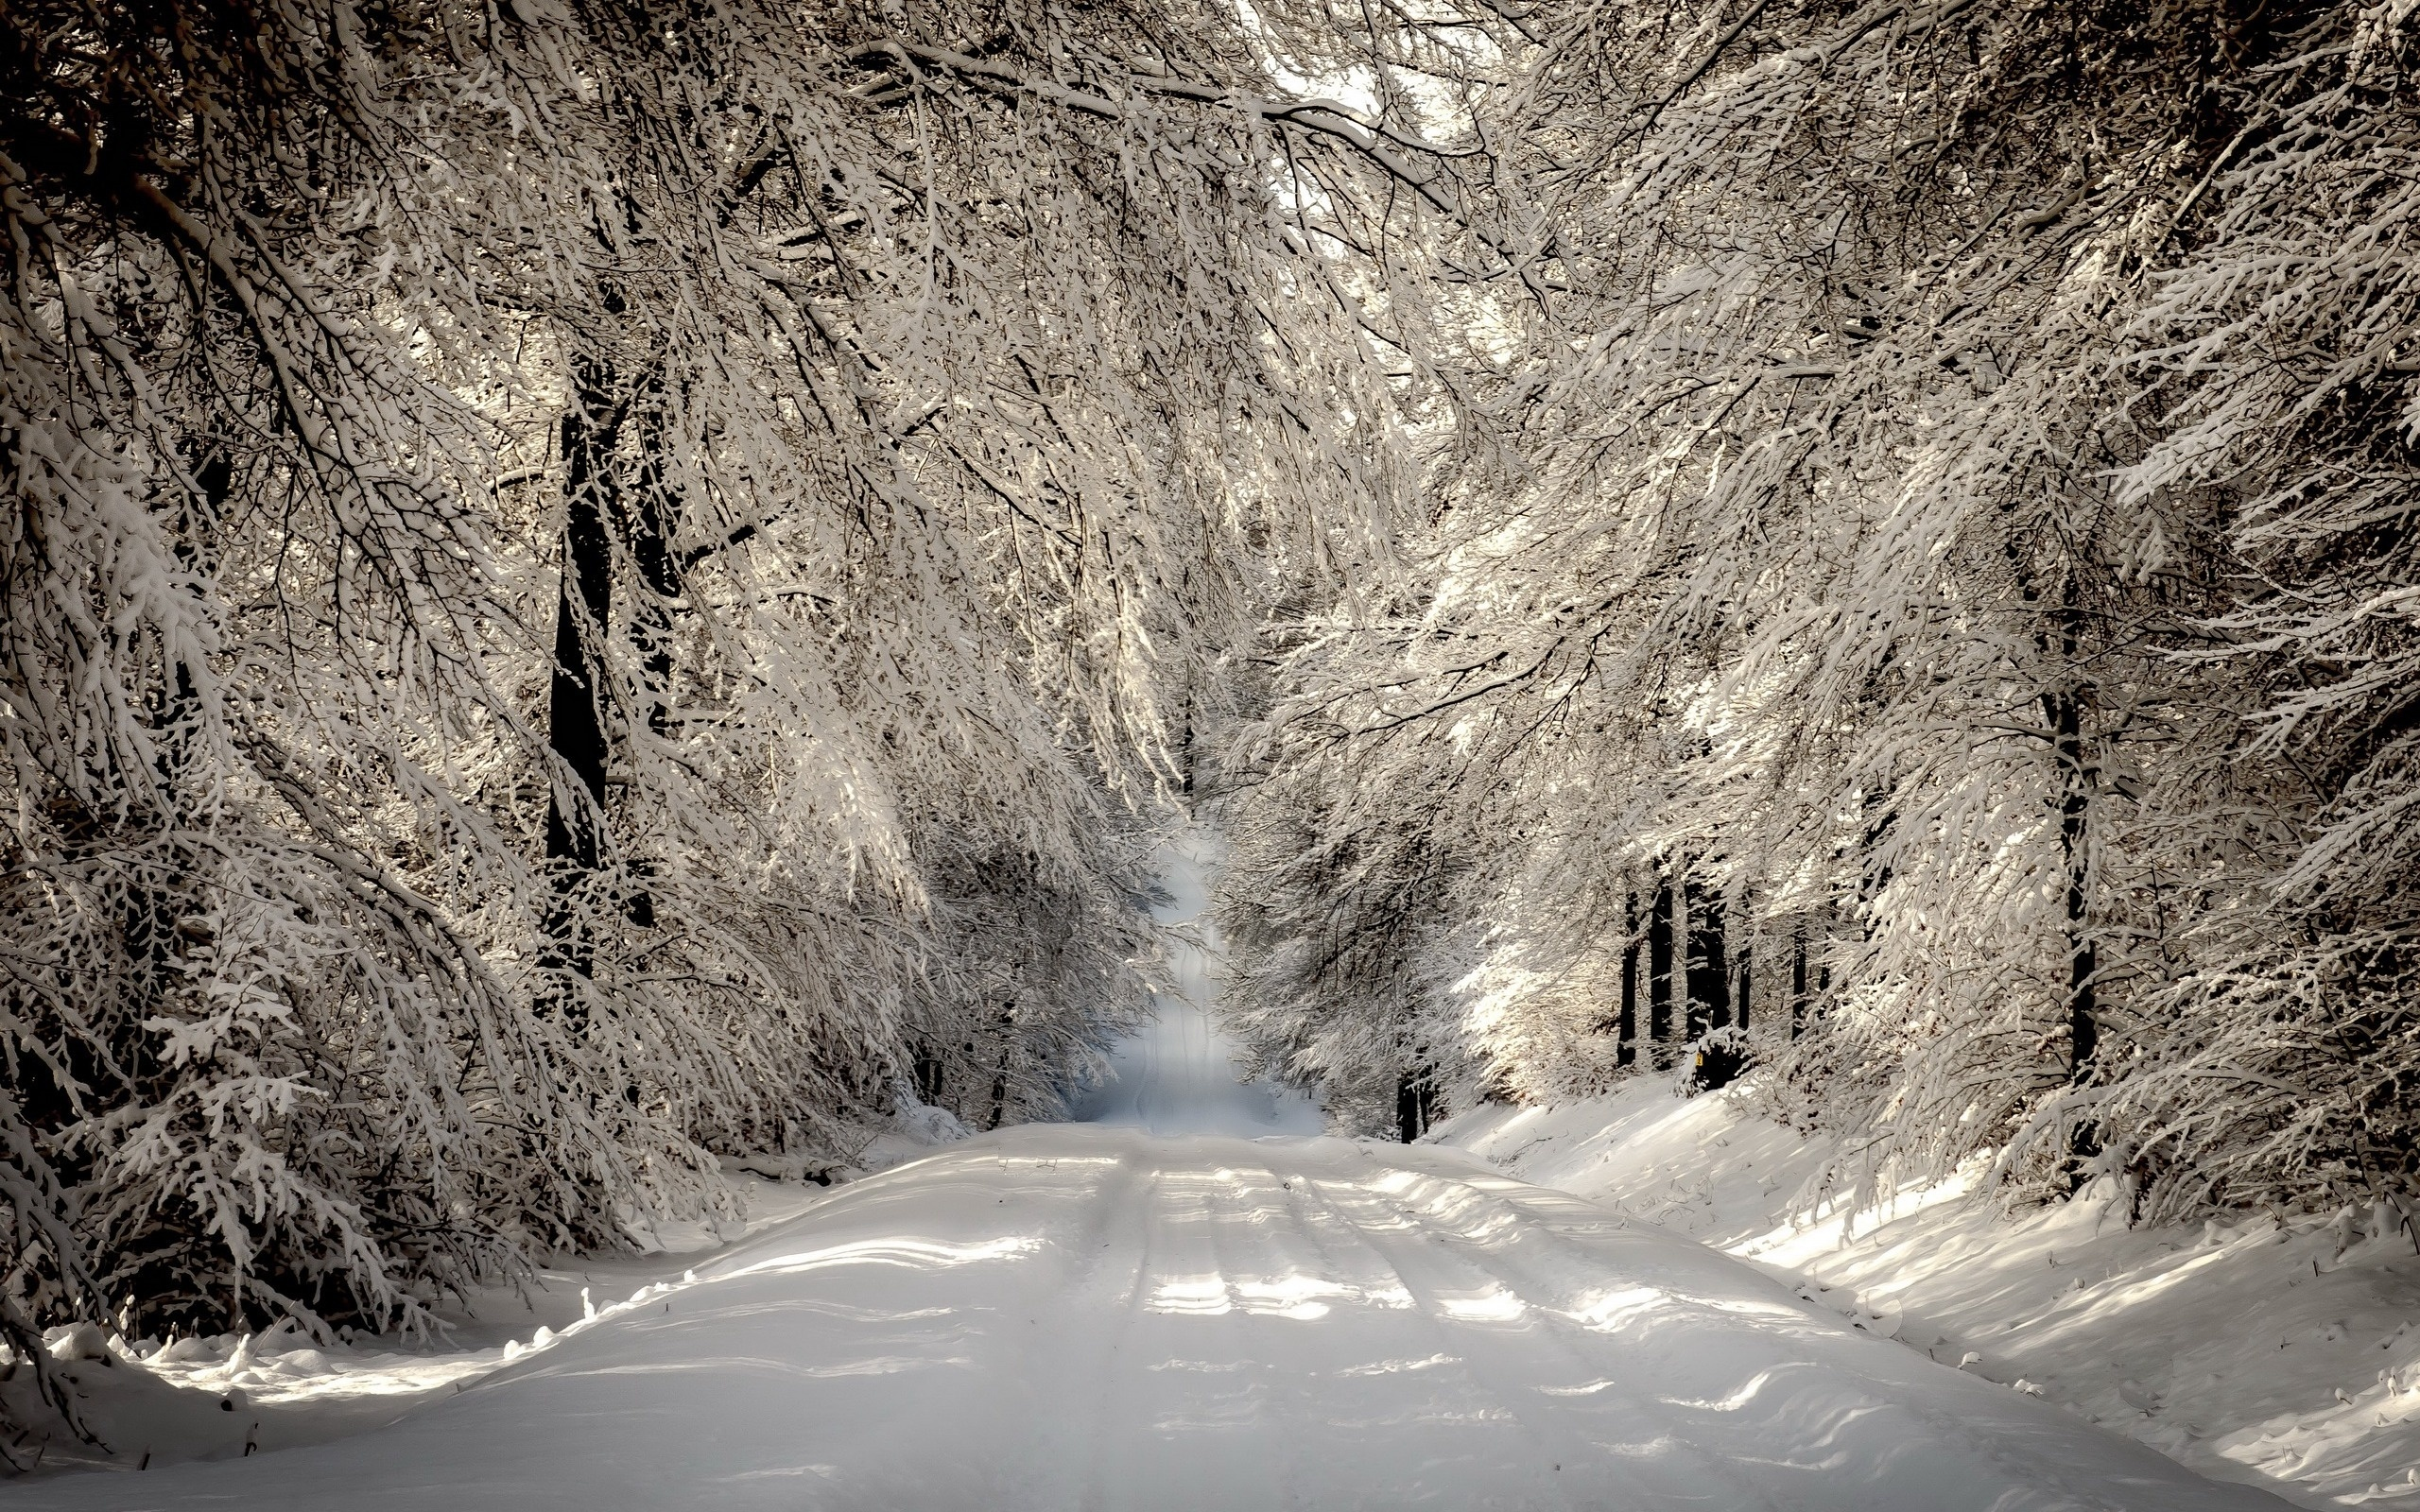 Красивая зимняя картинка на аву арку